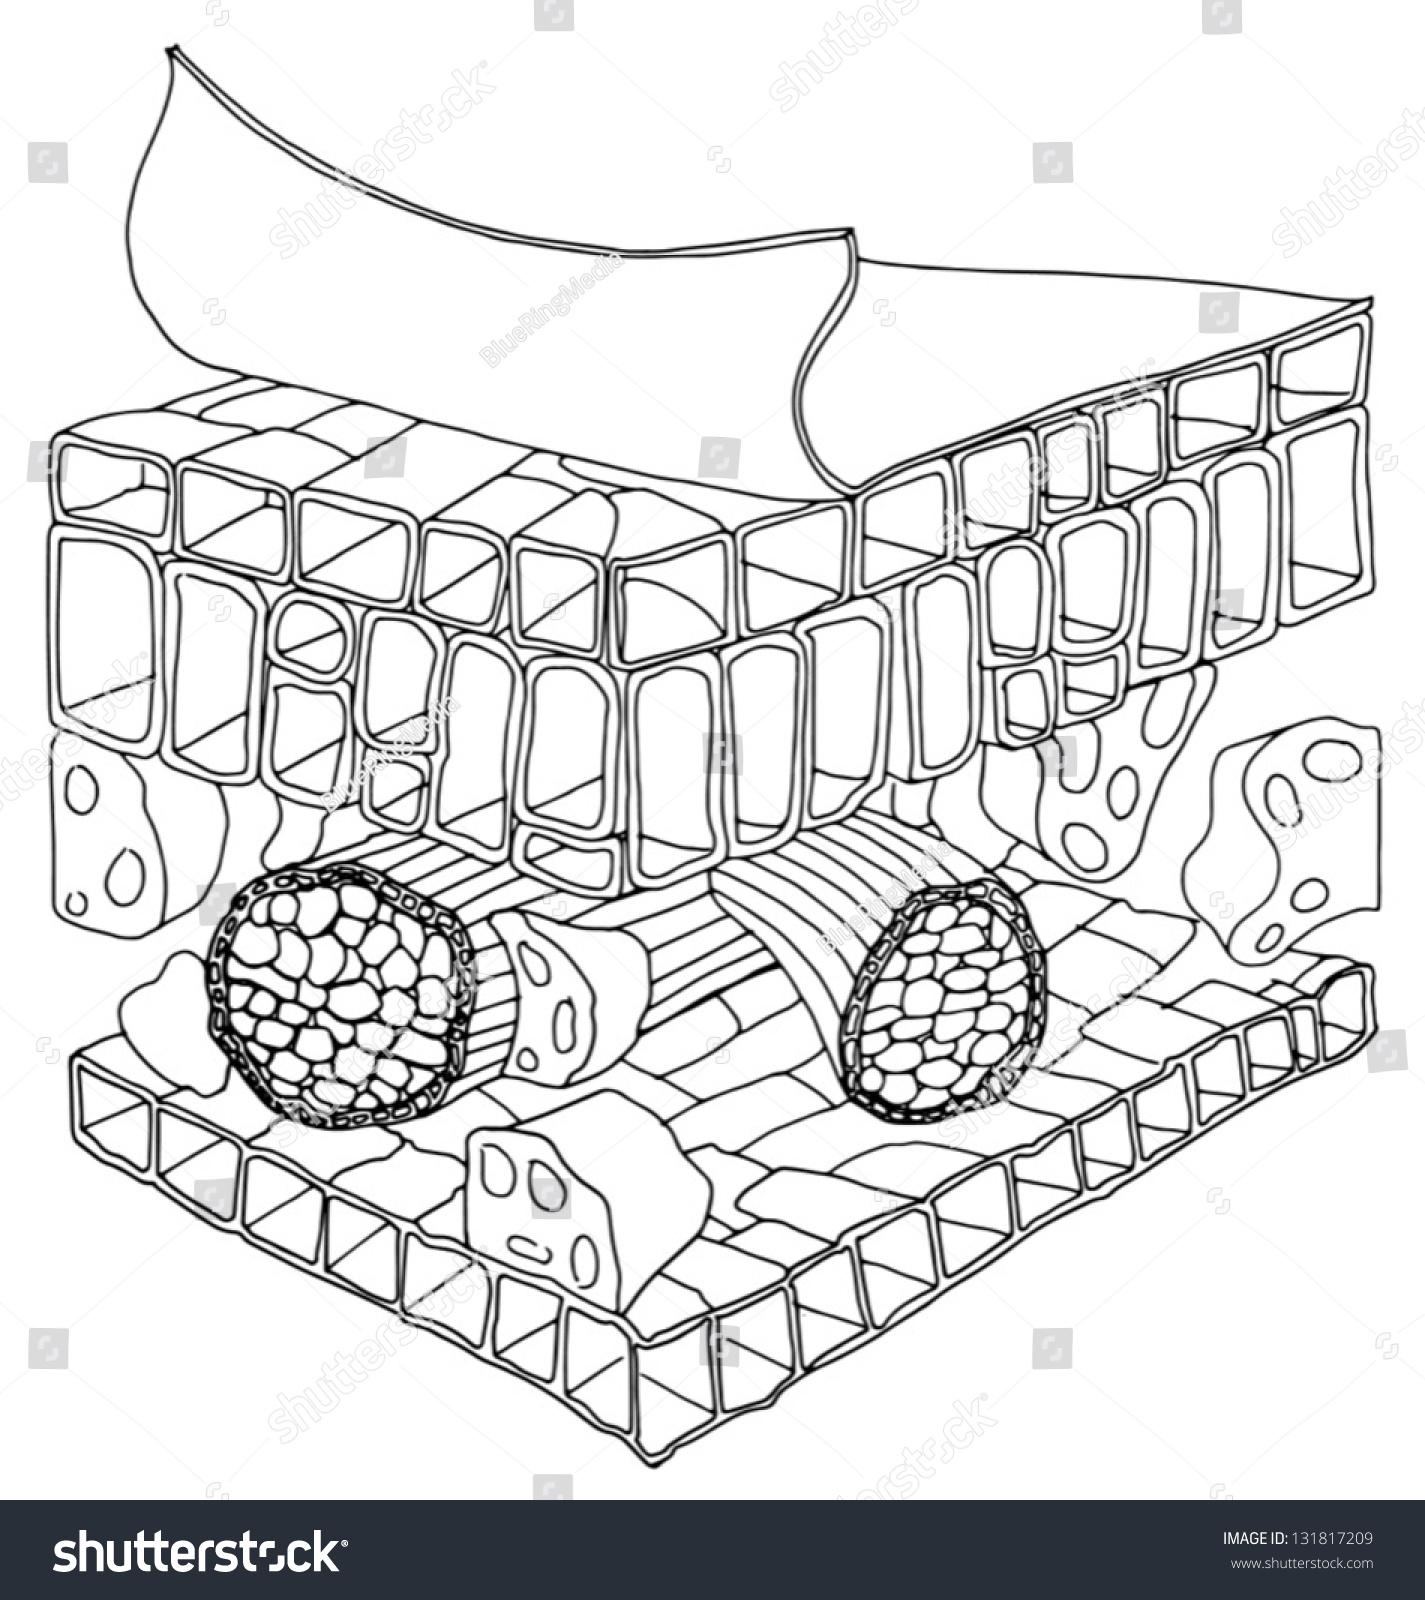 Black White Sketh Structure Leaf Stock Vector 131817209 - Shutterstock